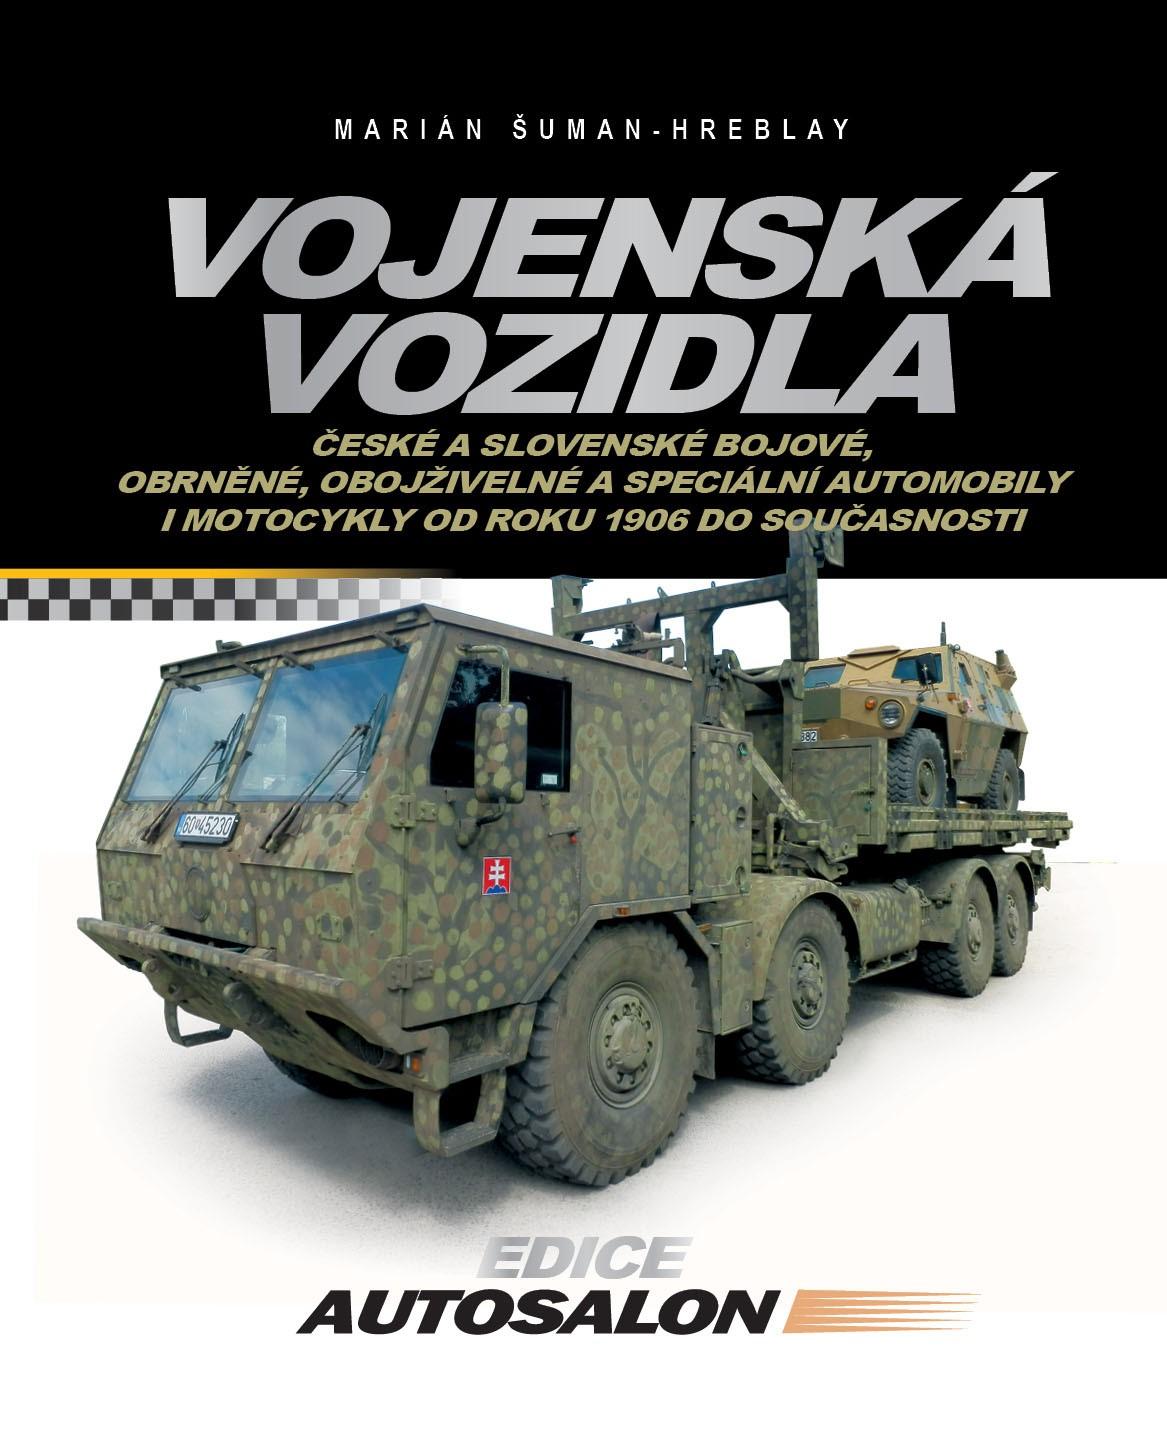 Vojenská vozidla